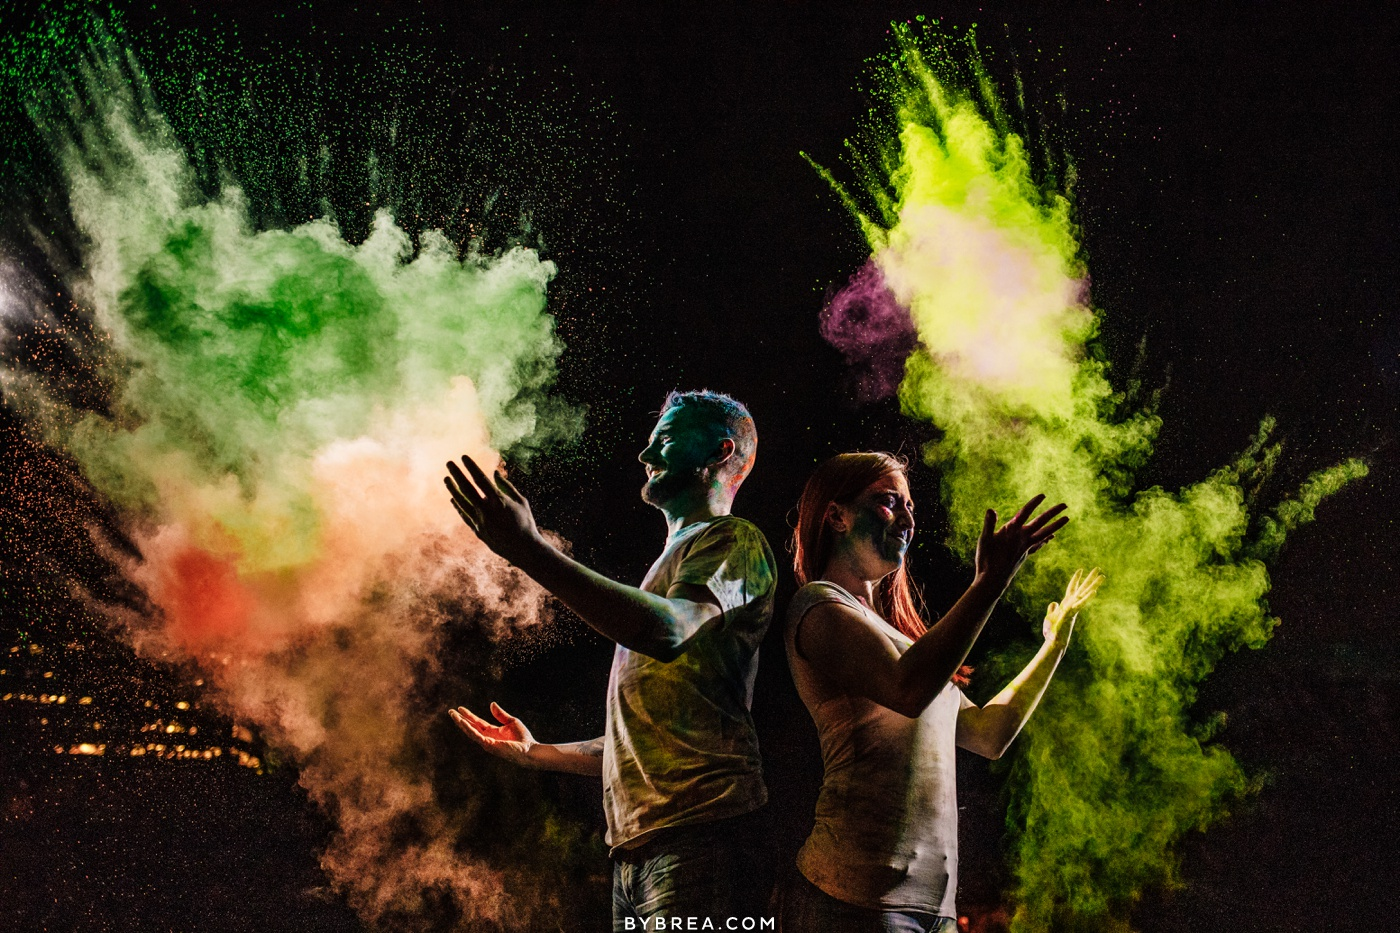 Creative night time paint powder engagement photo